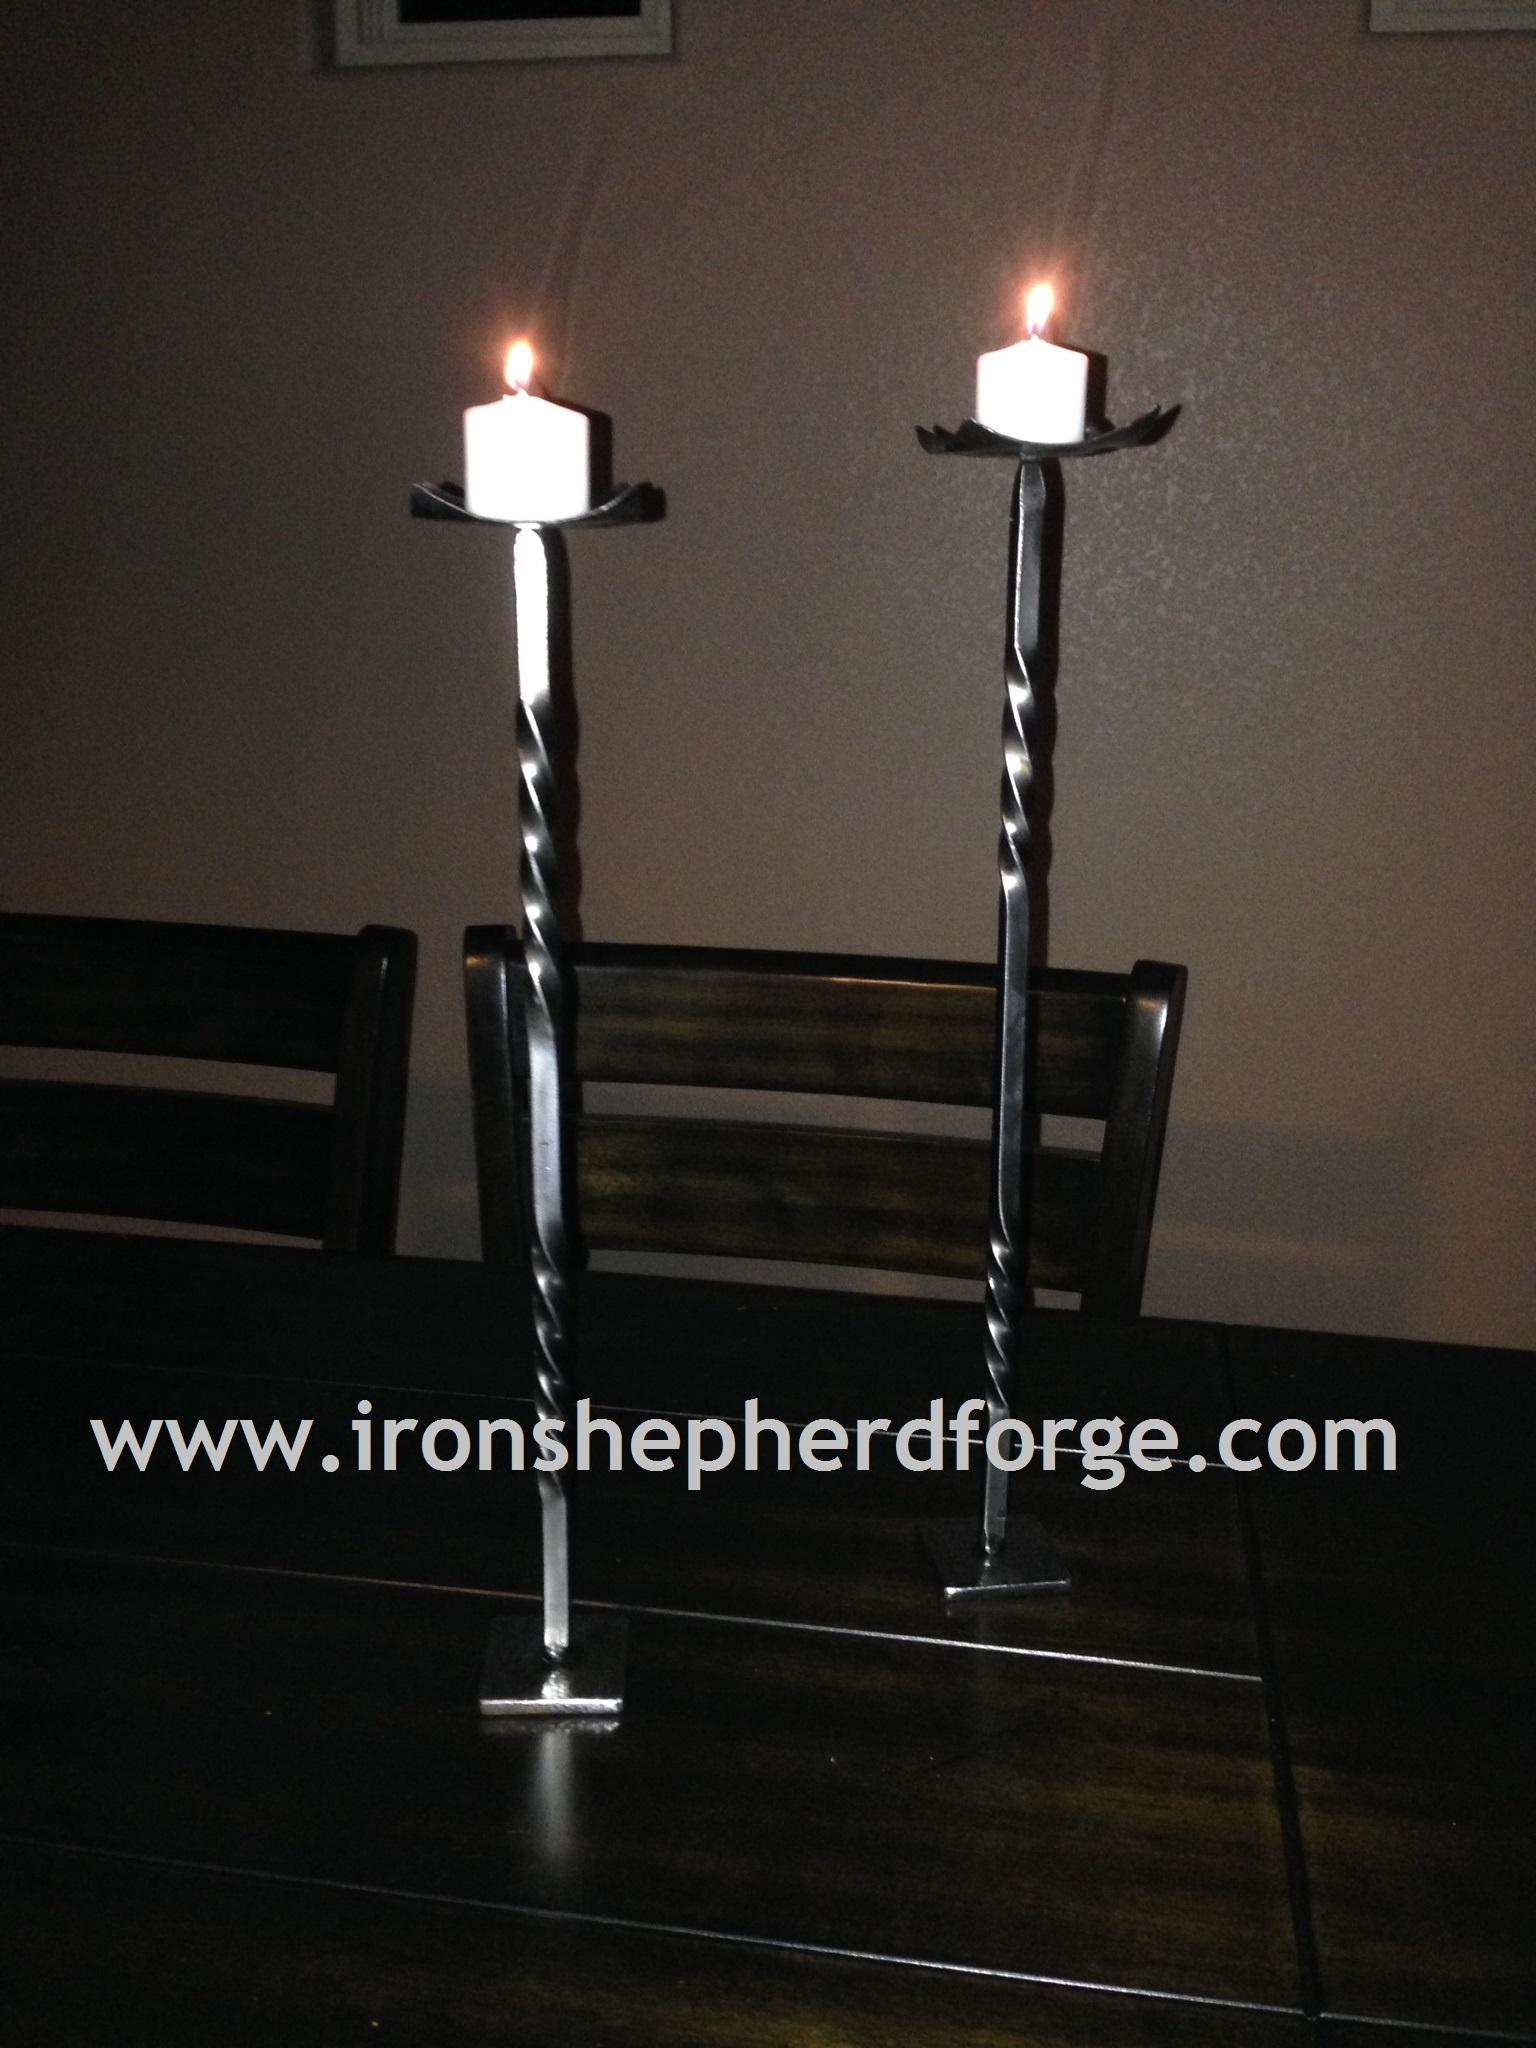 38 candlesticks WM